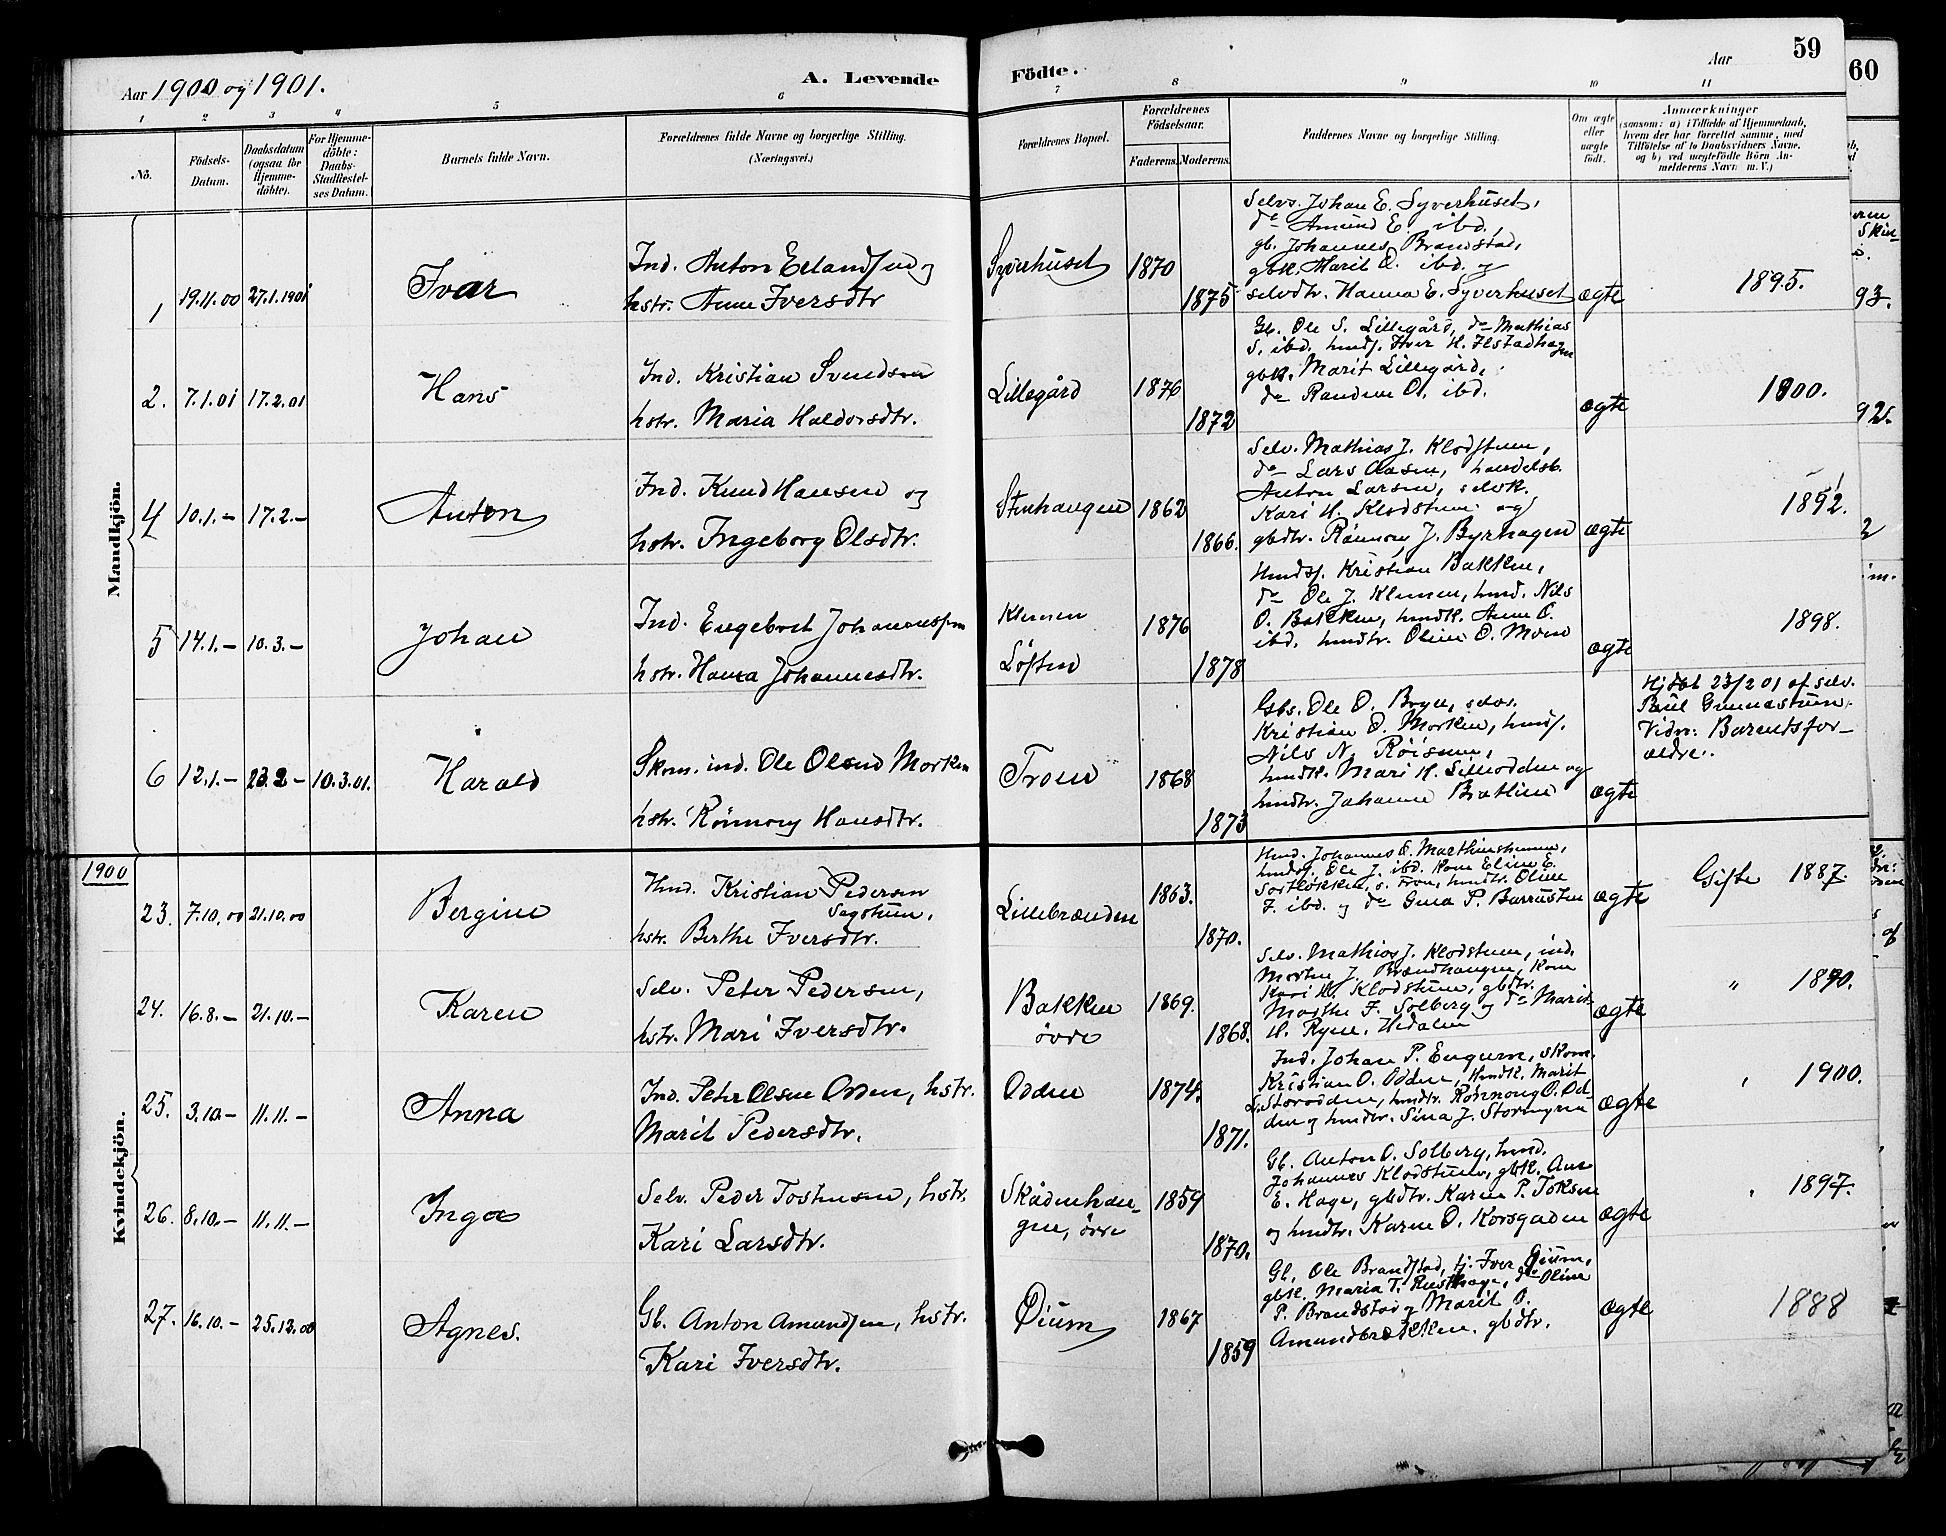 SAH, Nord-Fron prestekontor, Klokkerbok nr. 4, 1884-1914, s. 59